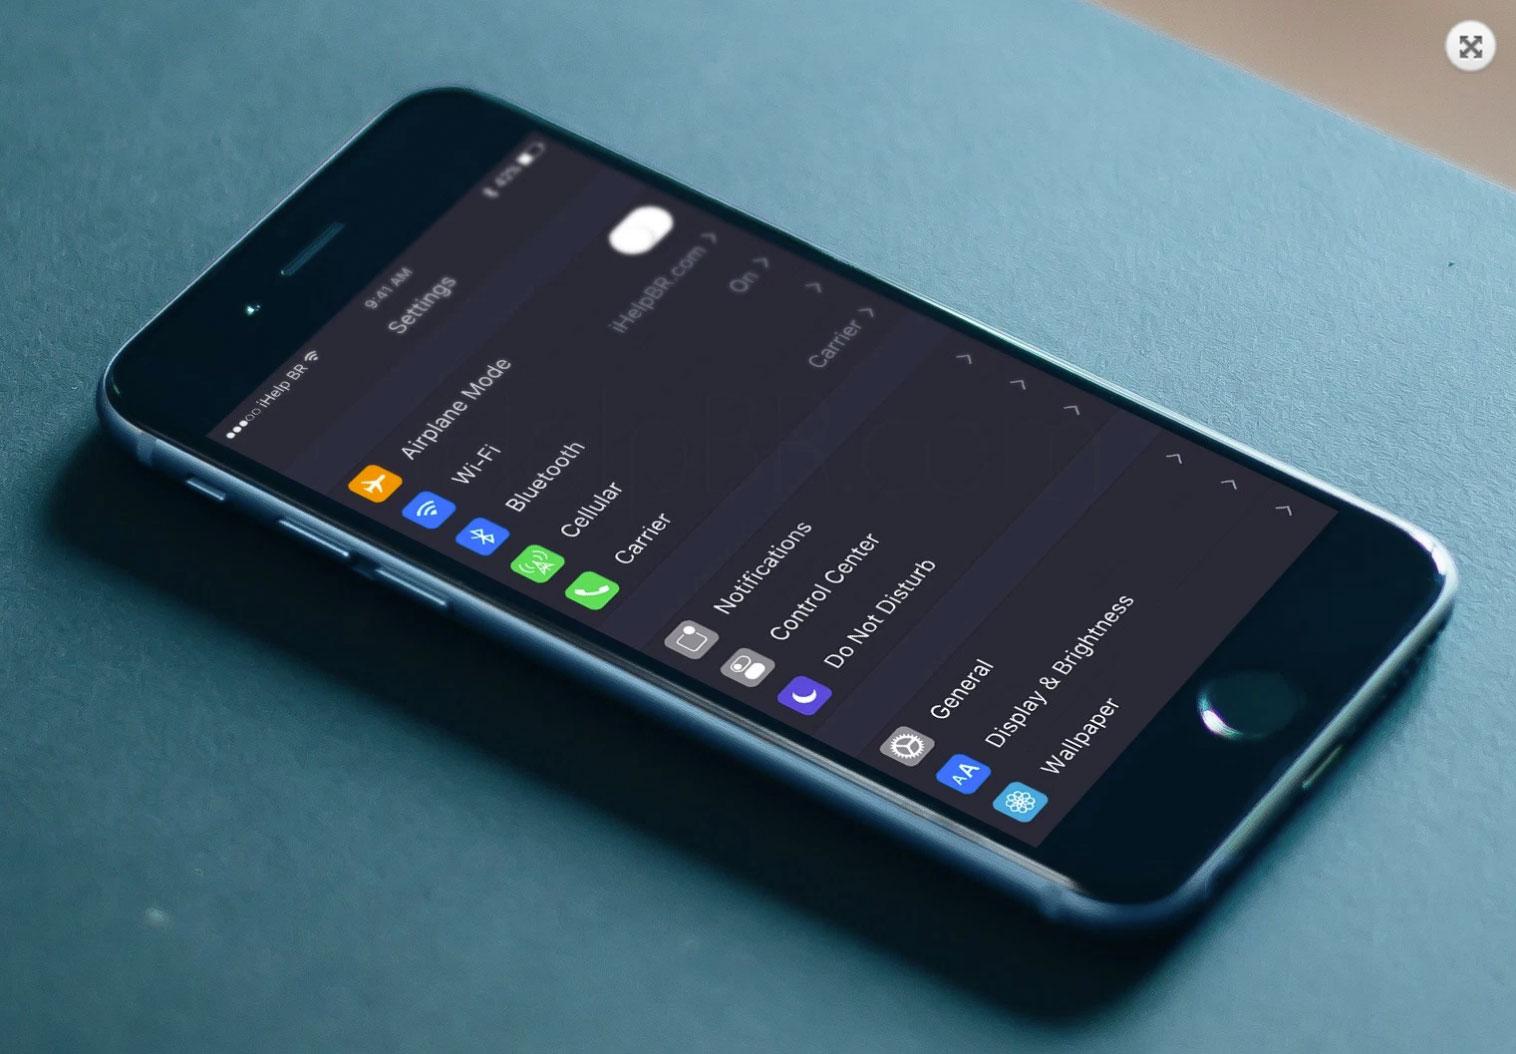 Interfaz imaginada de iOS 10 con fondo negro